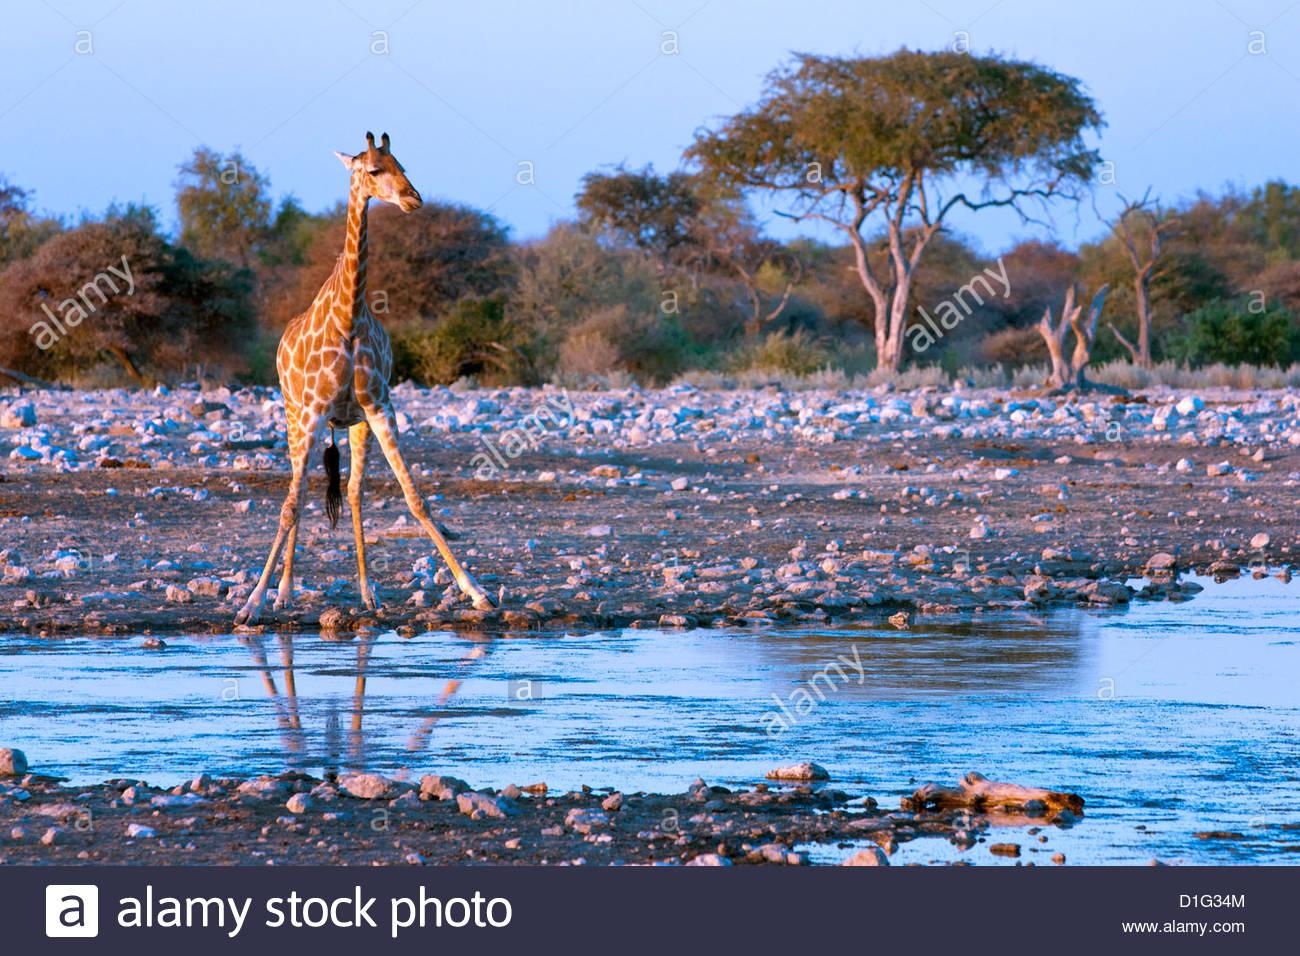 Jirafa (Giraffa camelopardis), Namibia, África Imagen De Stock